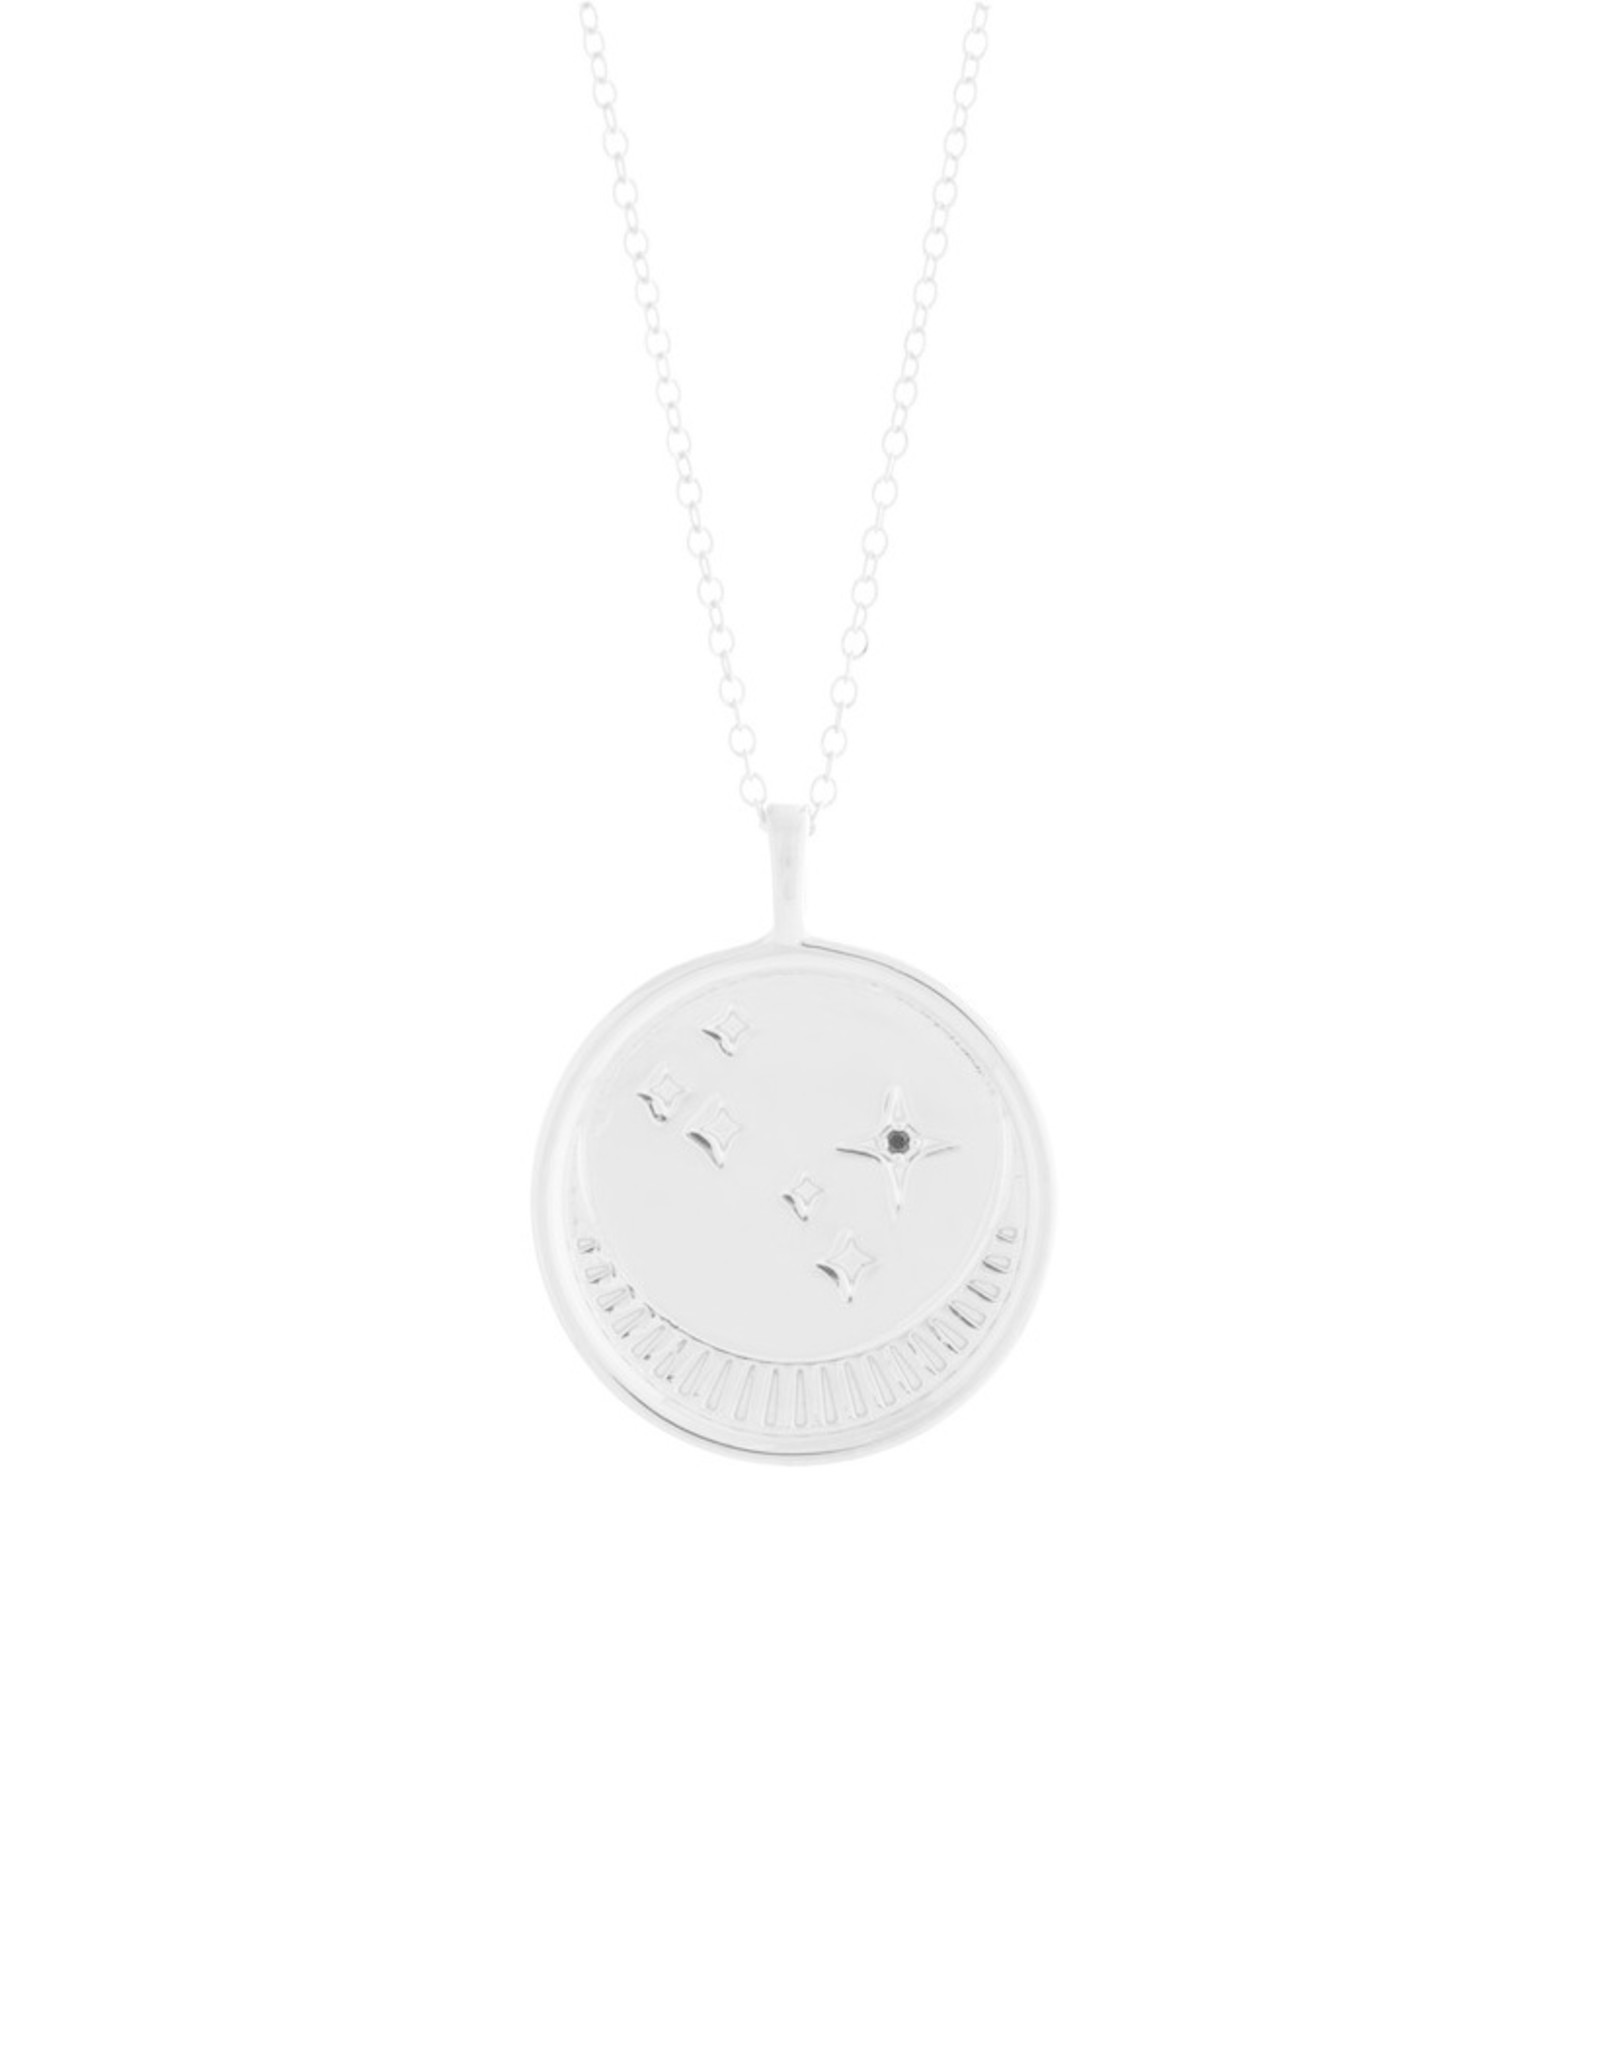 Sarah Mulder Jewelry Silver Franz Necklace - Onyx